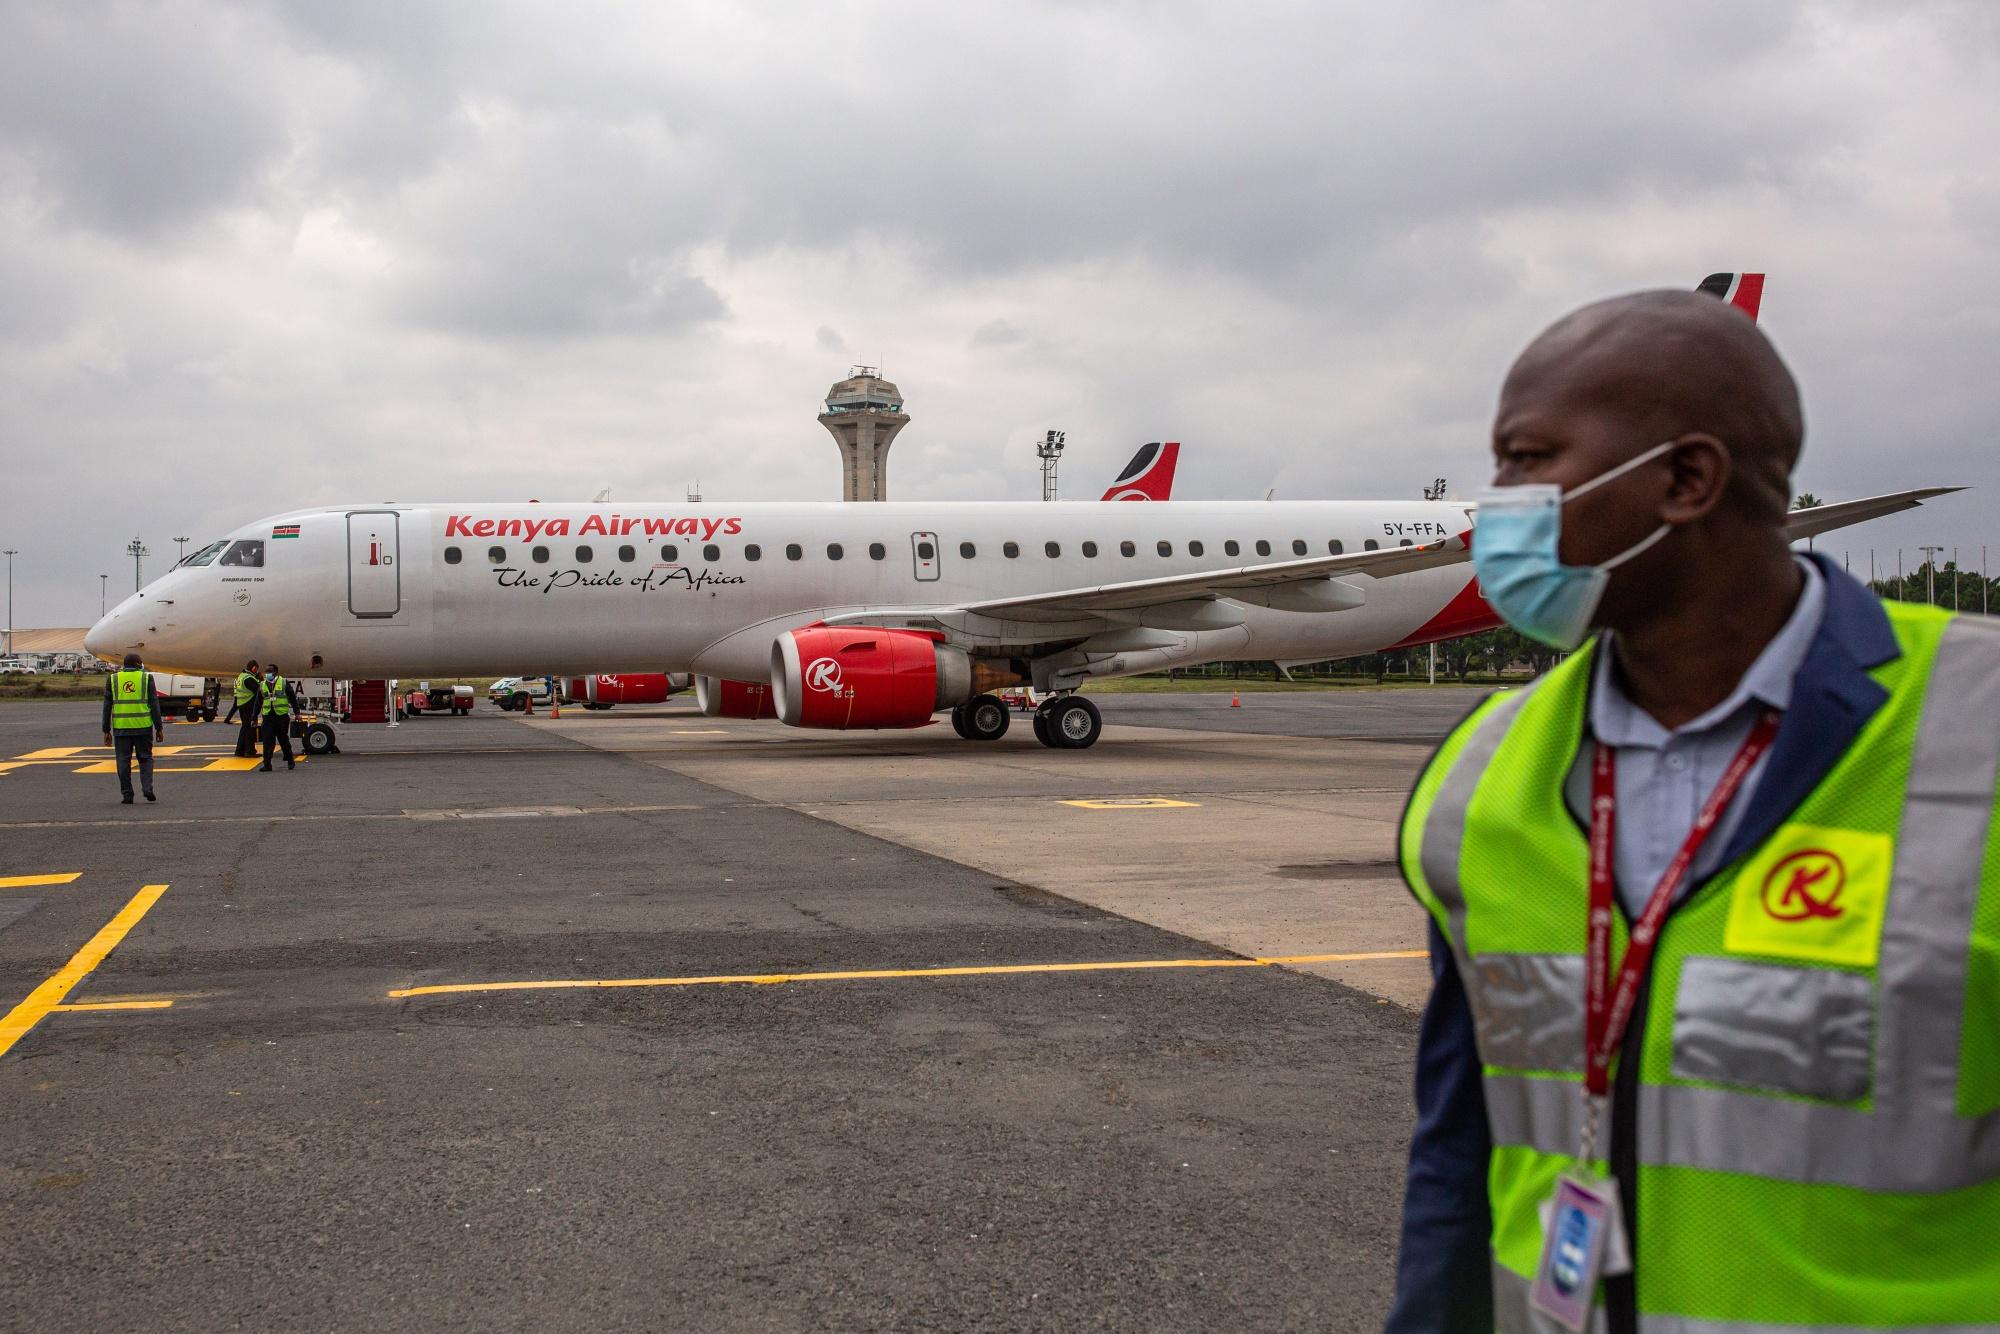 A Kenya Airways aircraft on the tarmac at Jomo Kenyatta International Airport in Nairobi.